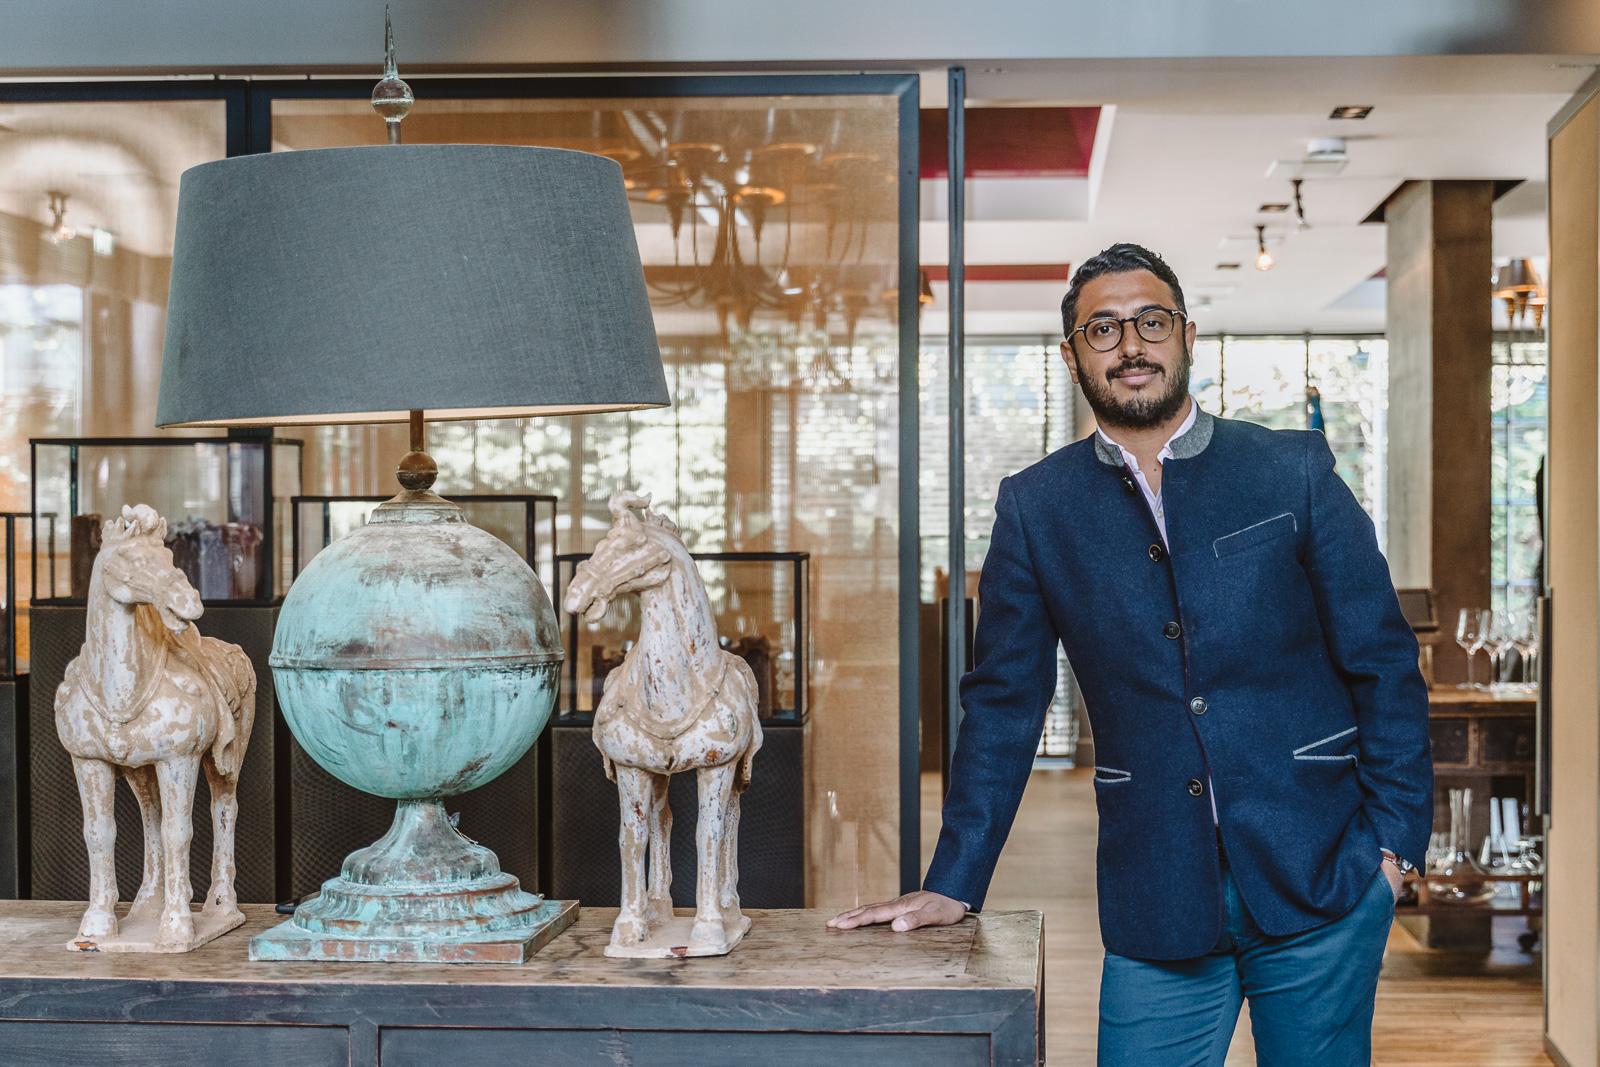 Businessportrait - Oskar in der Remise in Bonn